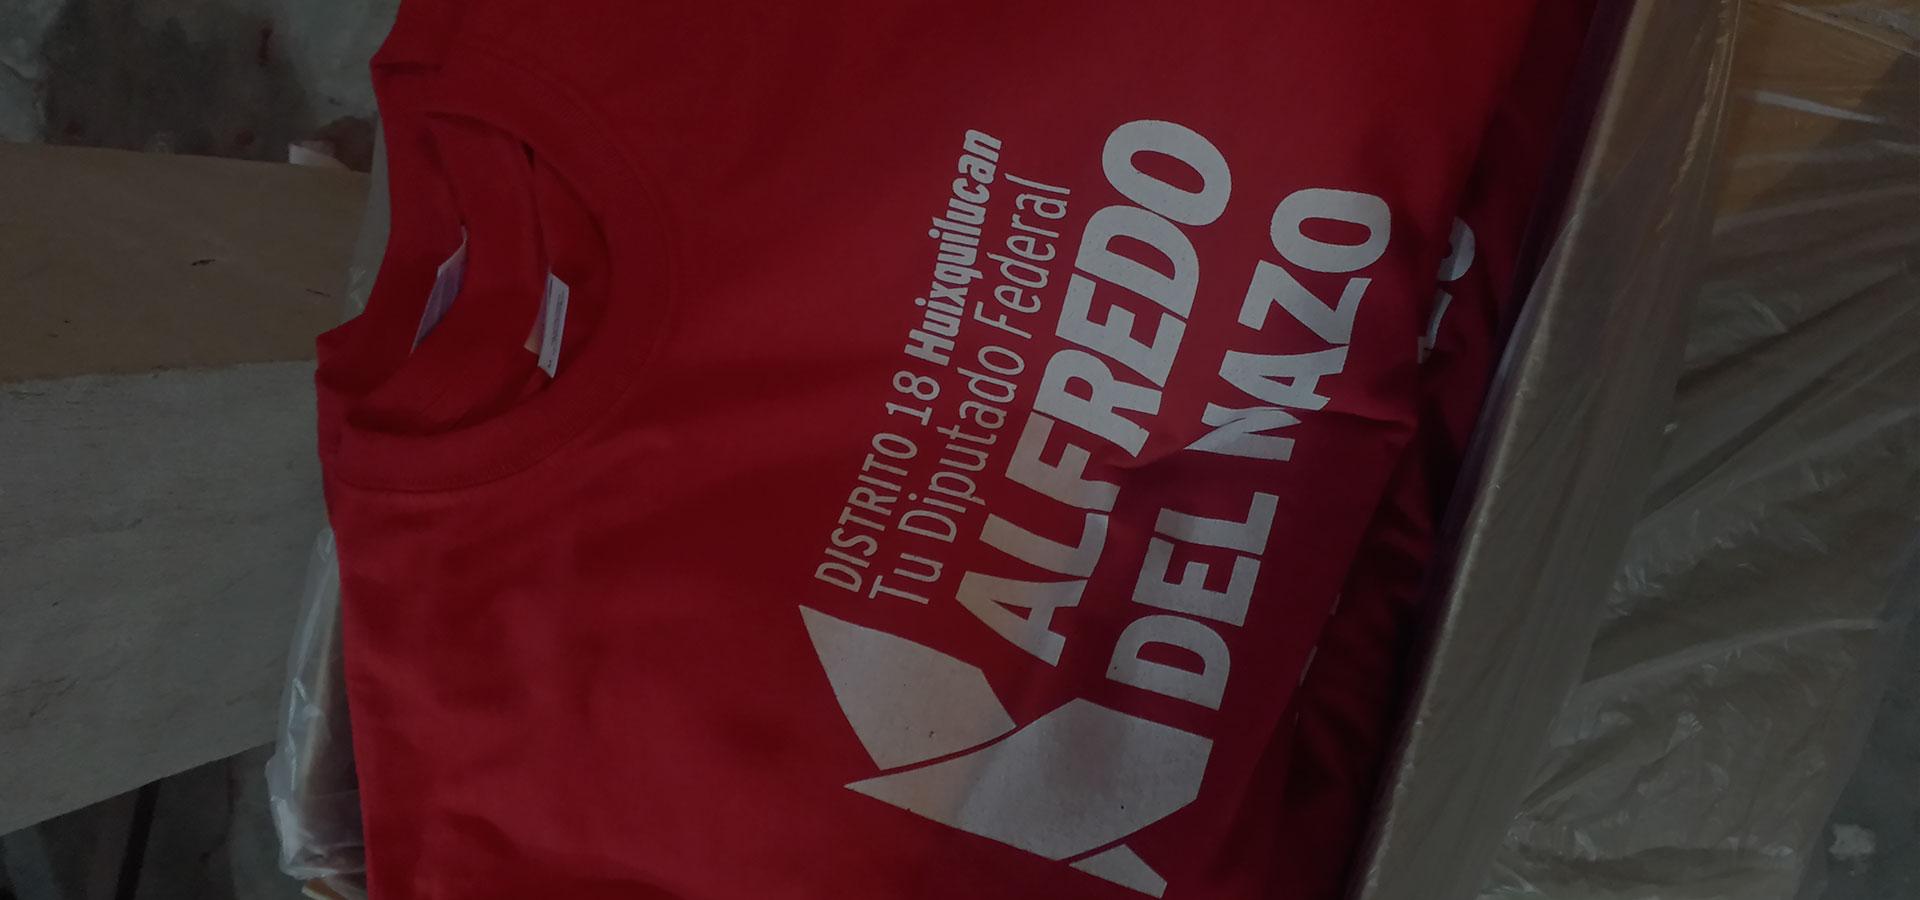 Impresión de playeras de campañas politicas en Querétaro fd5c4caf929c6